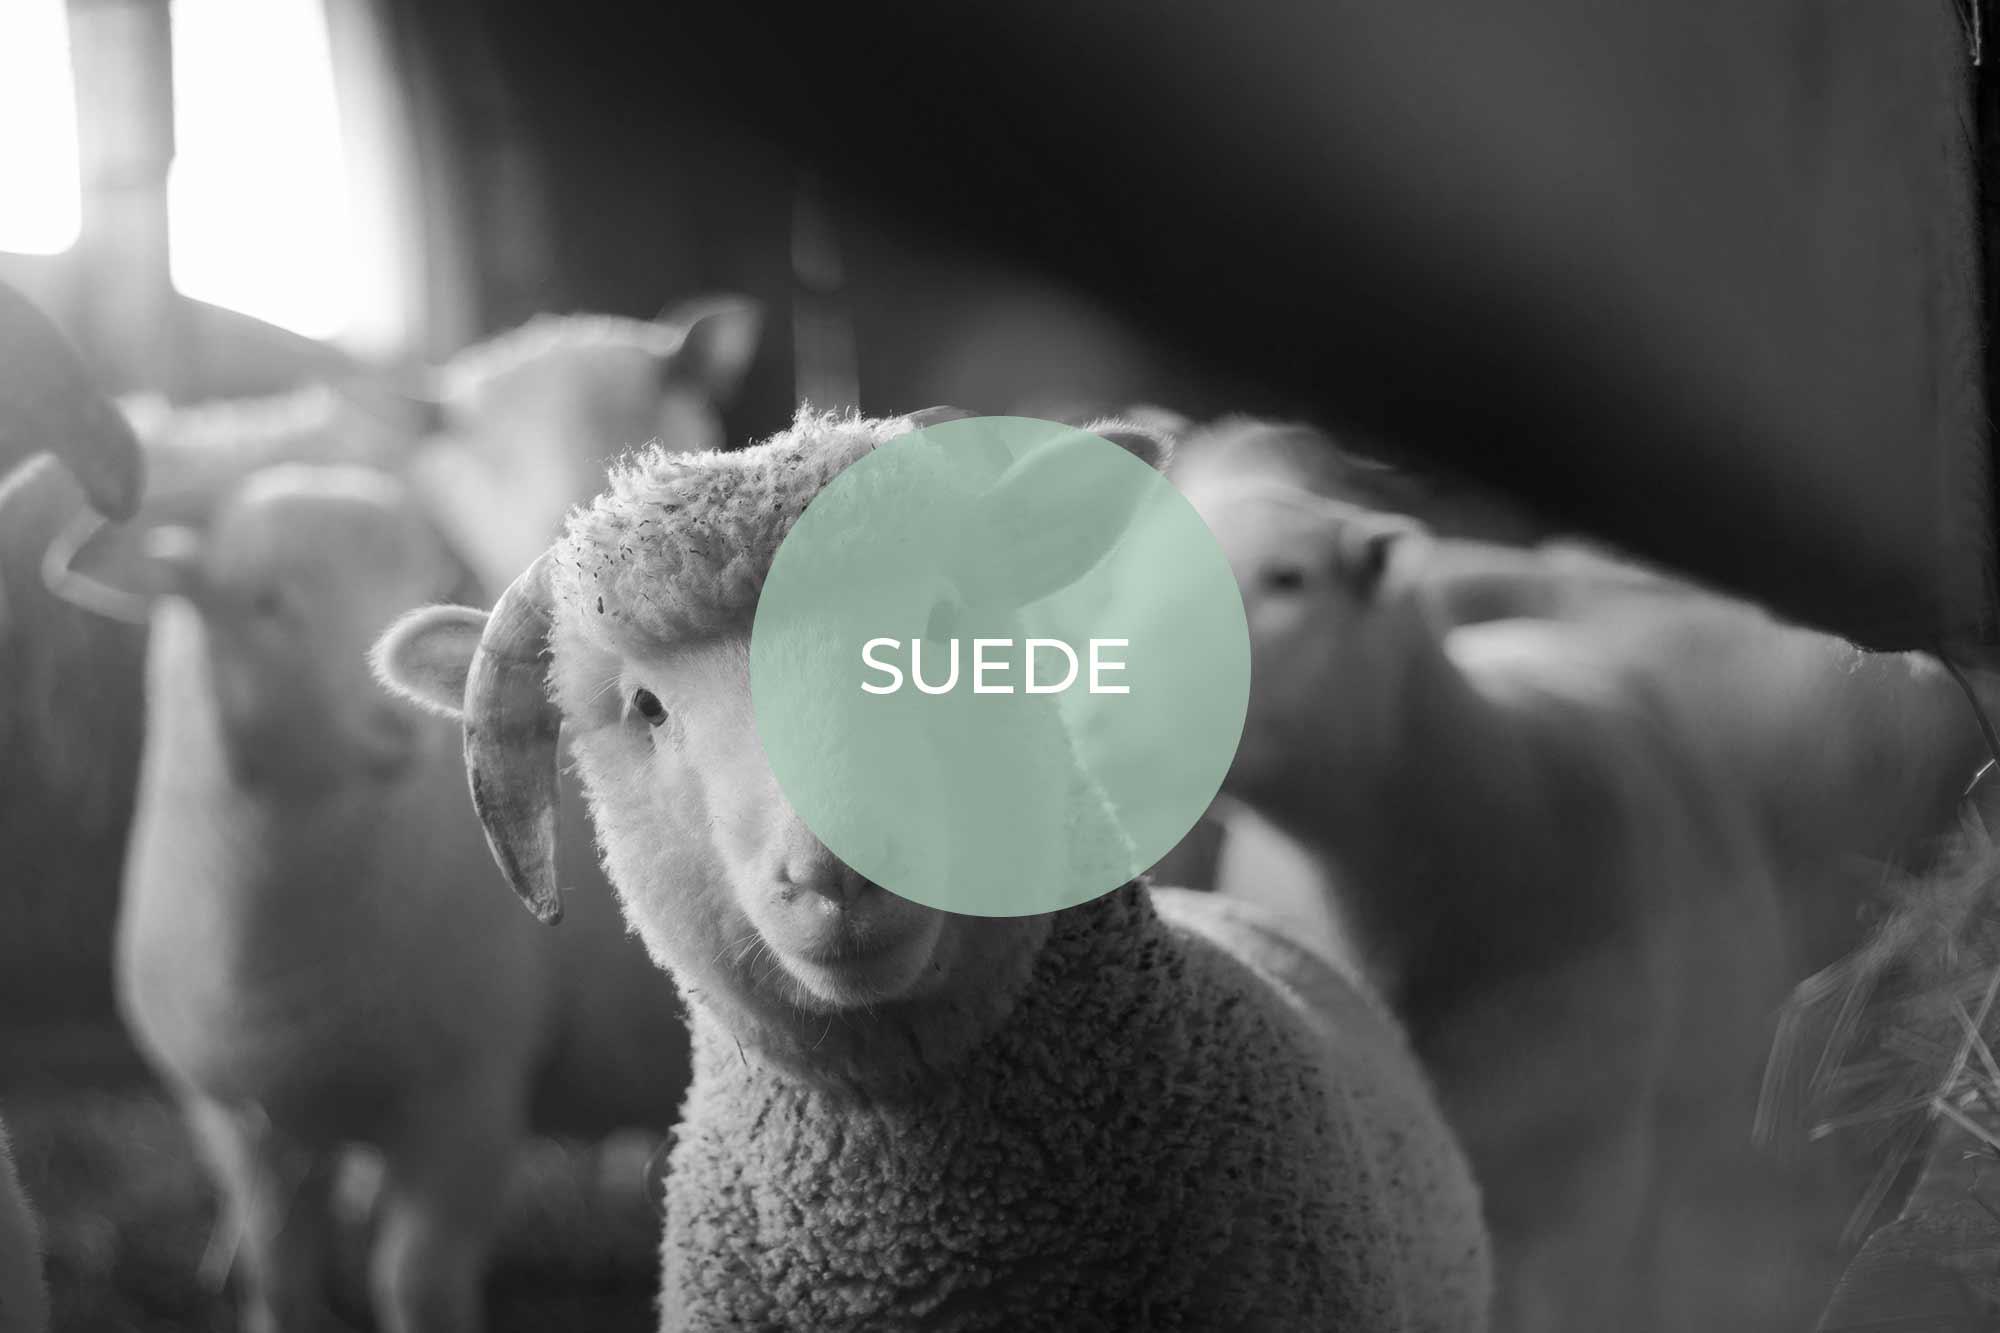 suede its vegan made